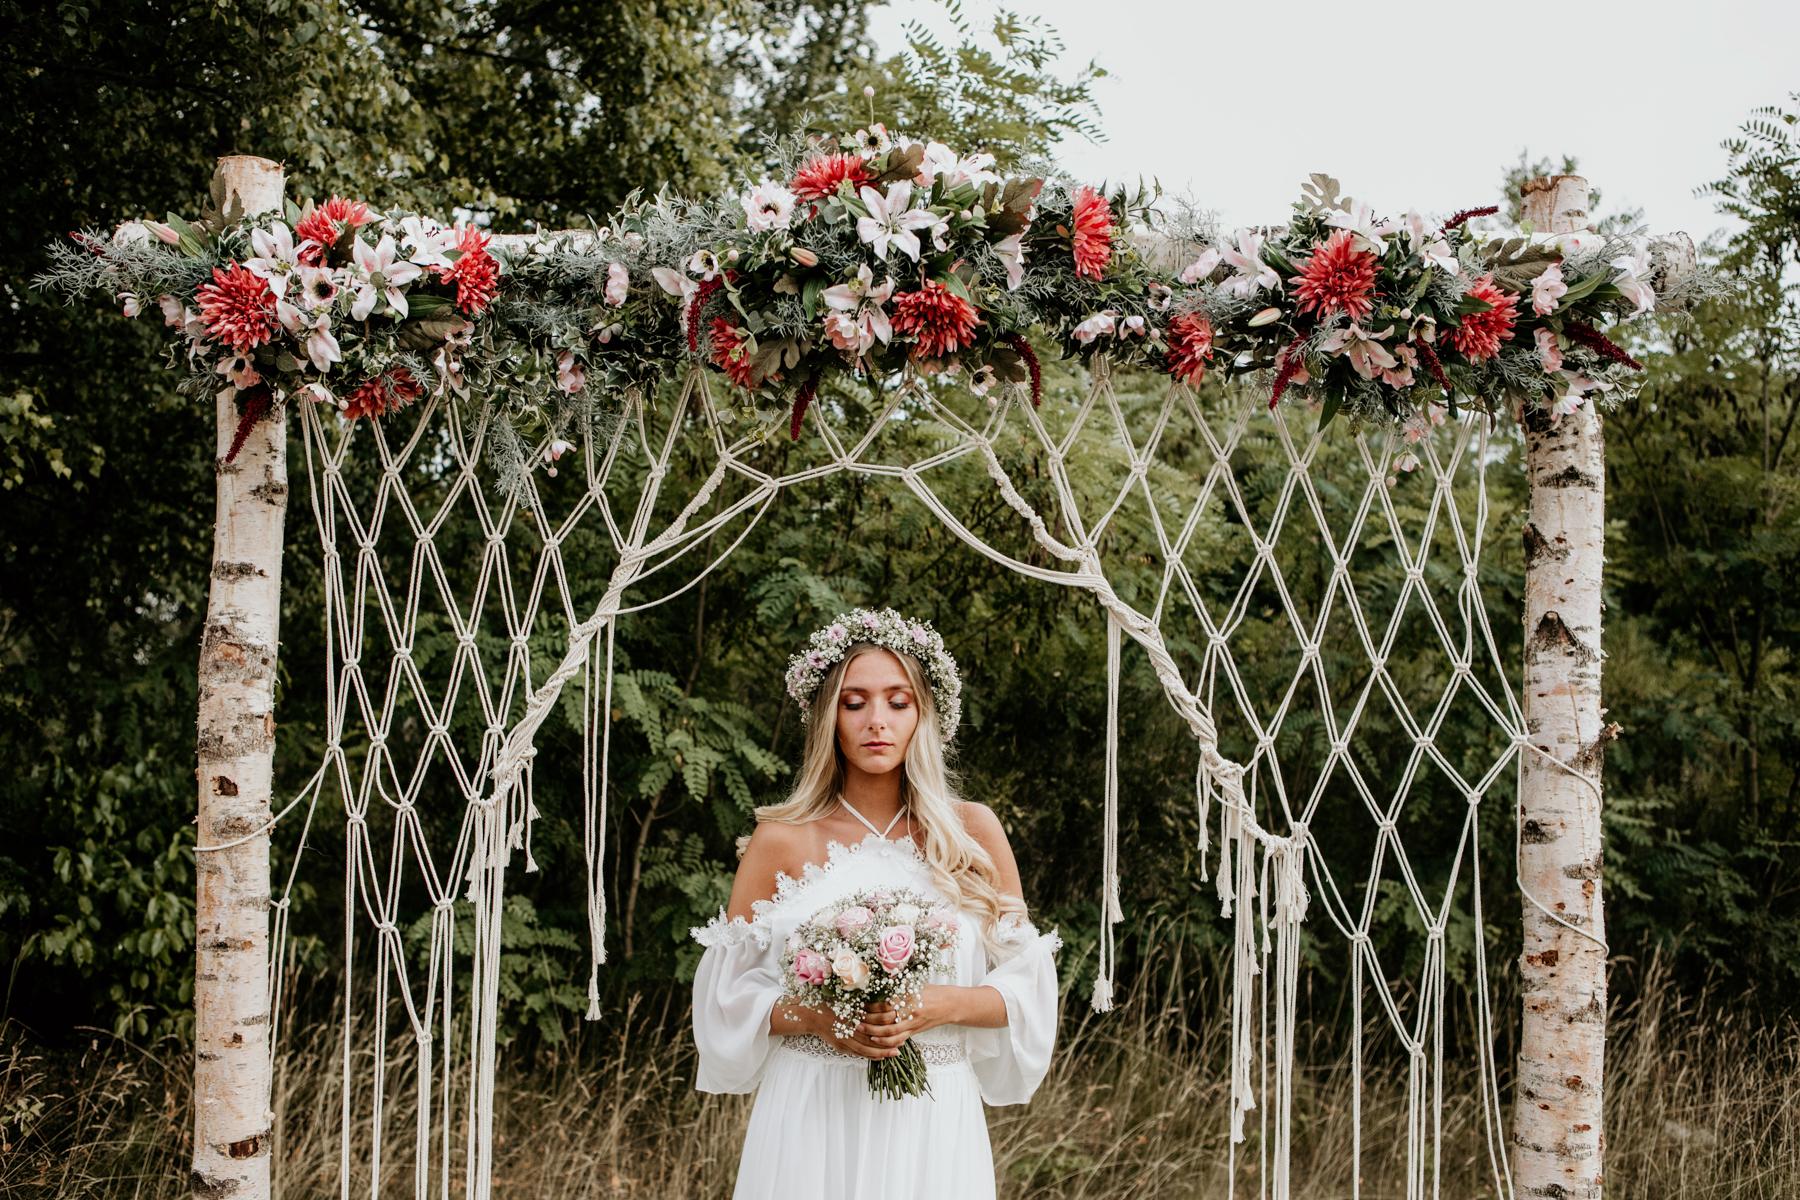 Styled Wedding 1 beeld.schoon-selinderella klein formaat-81